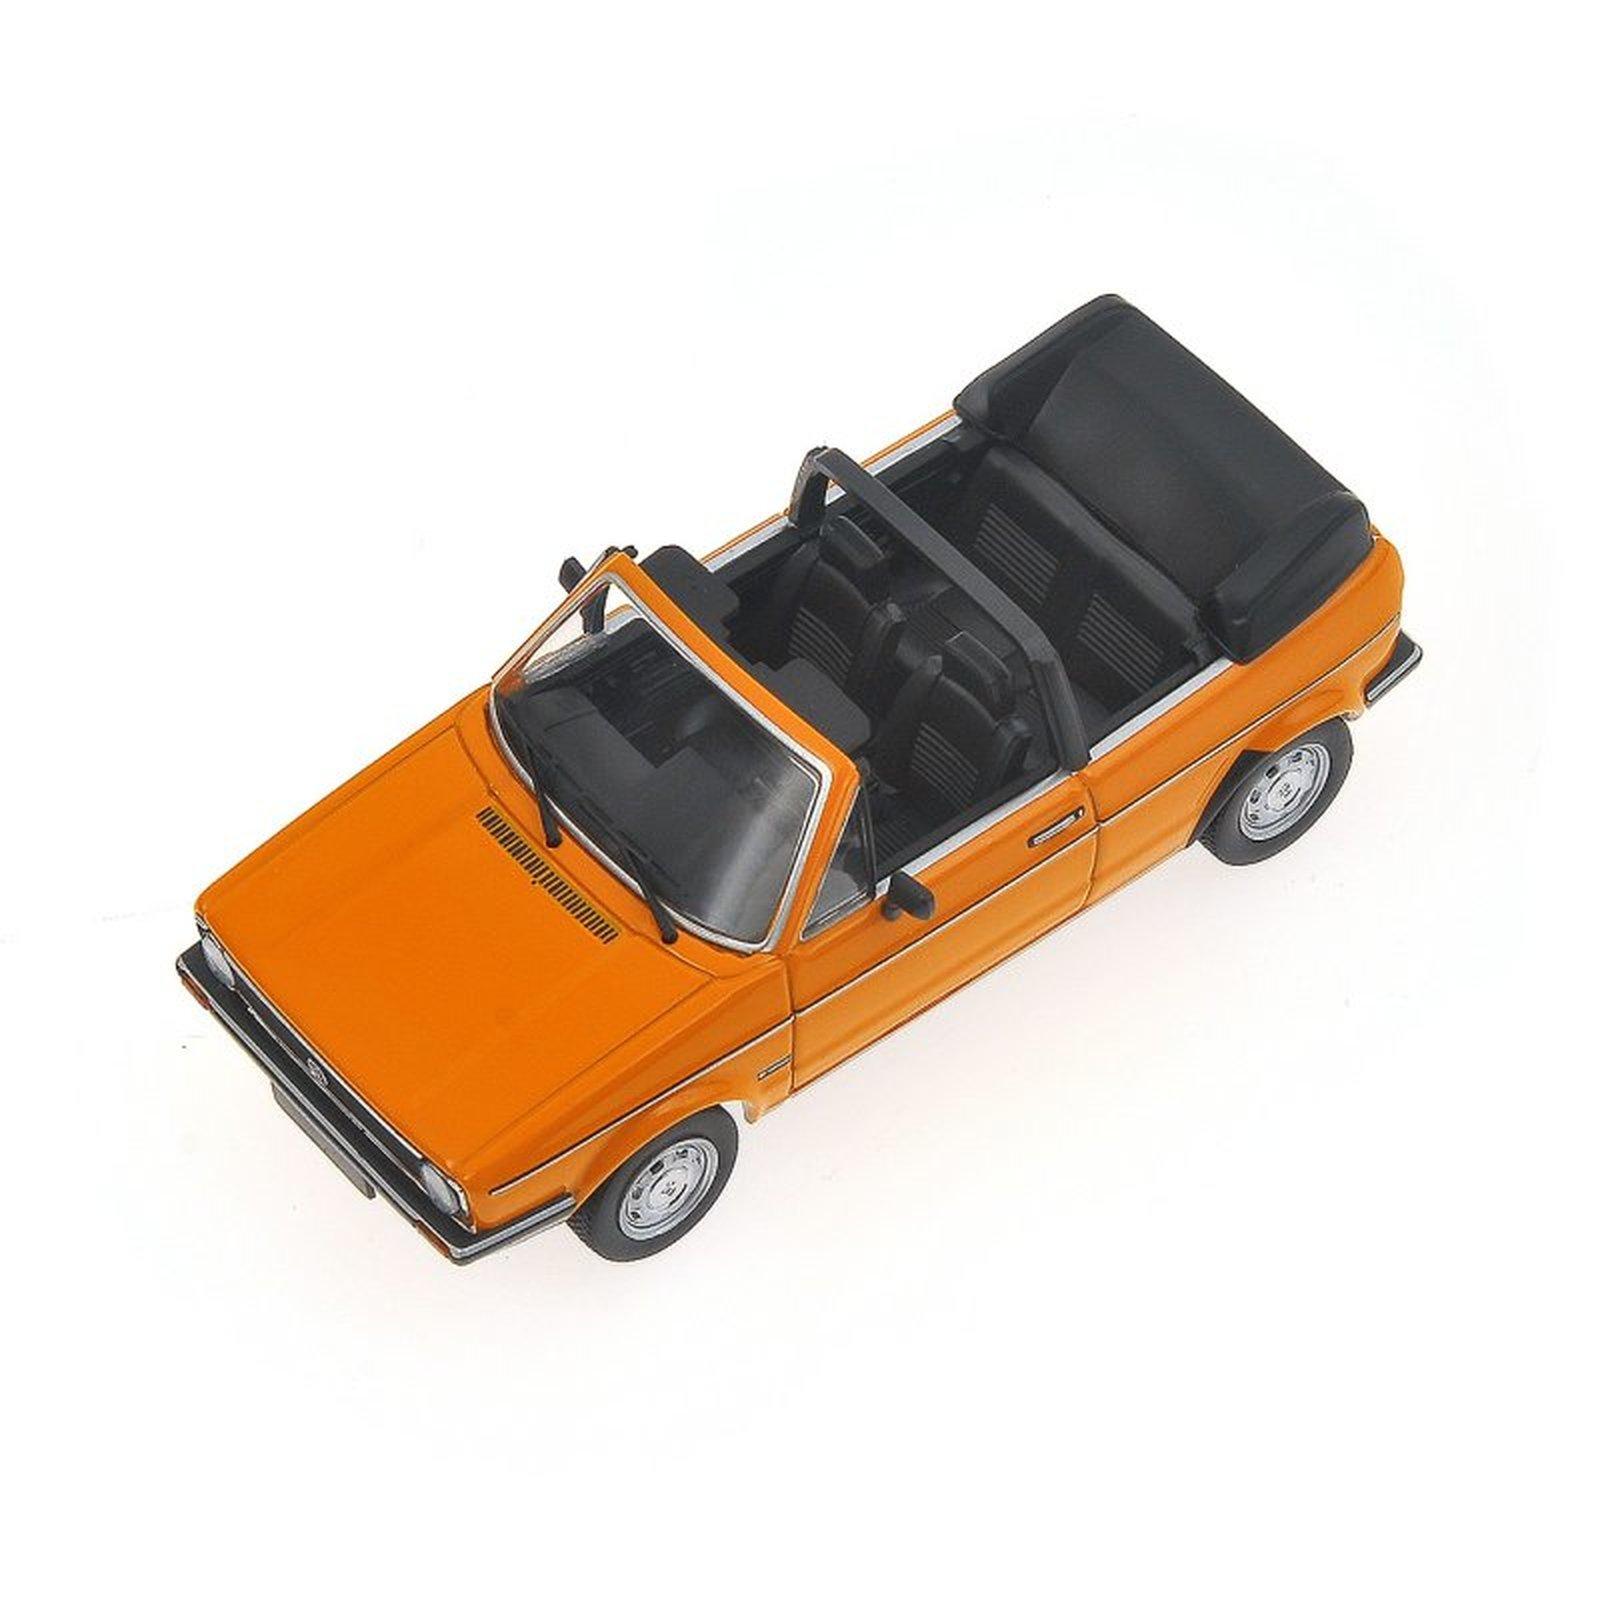 minichamps 400055131 vw golf i cabrio orange 1980. Black Bedroom Furniture Sets. Home Design Ideas